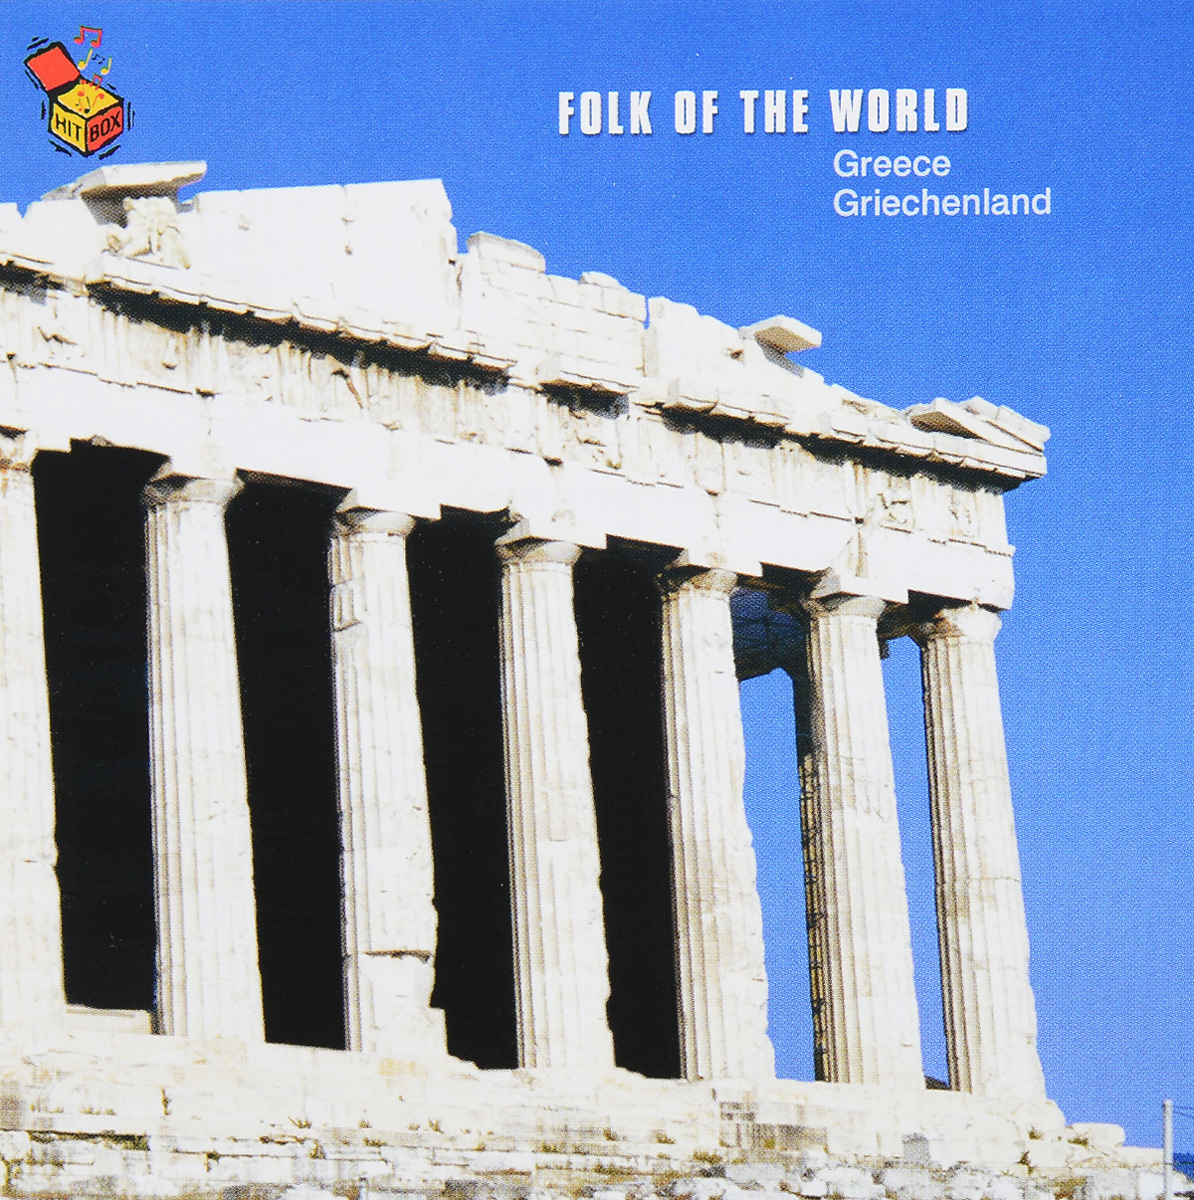 Folk Of The World. Greece folk of the world brazil